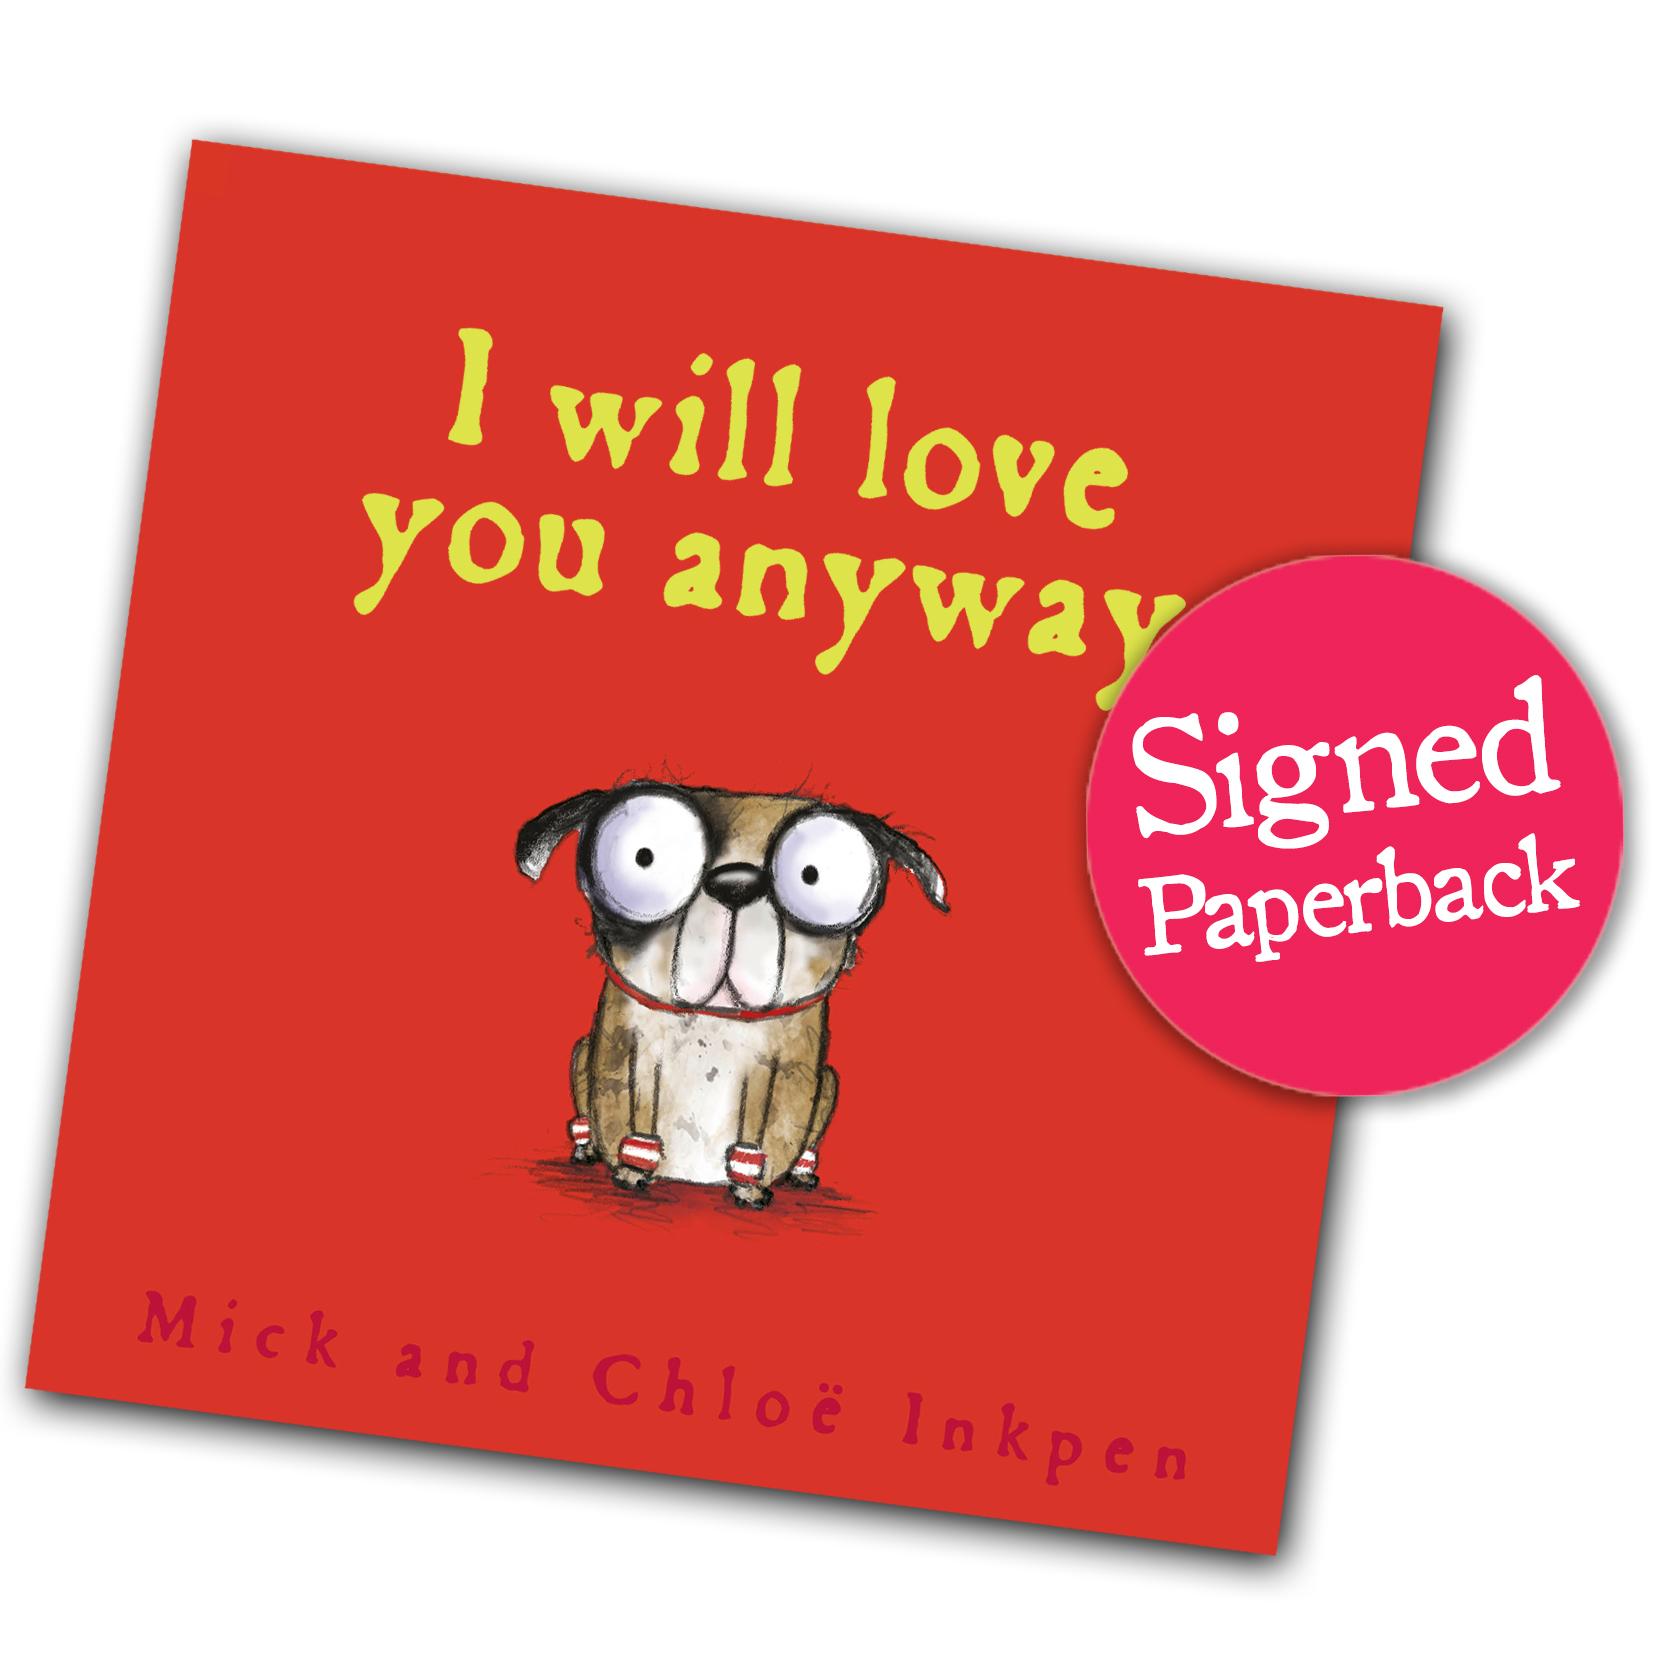 IWLYA signed paperback.jpg